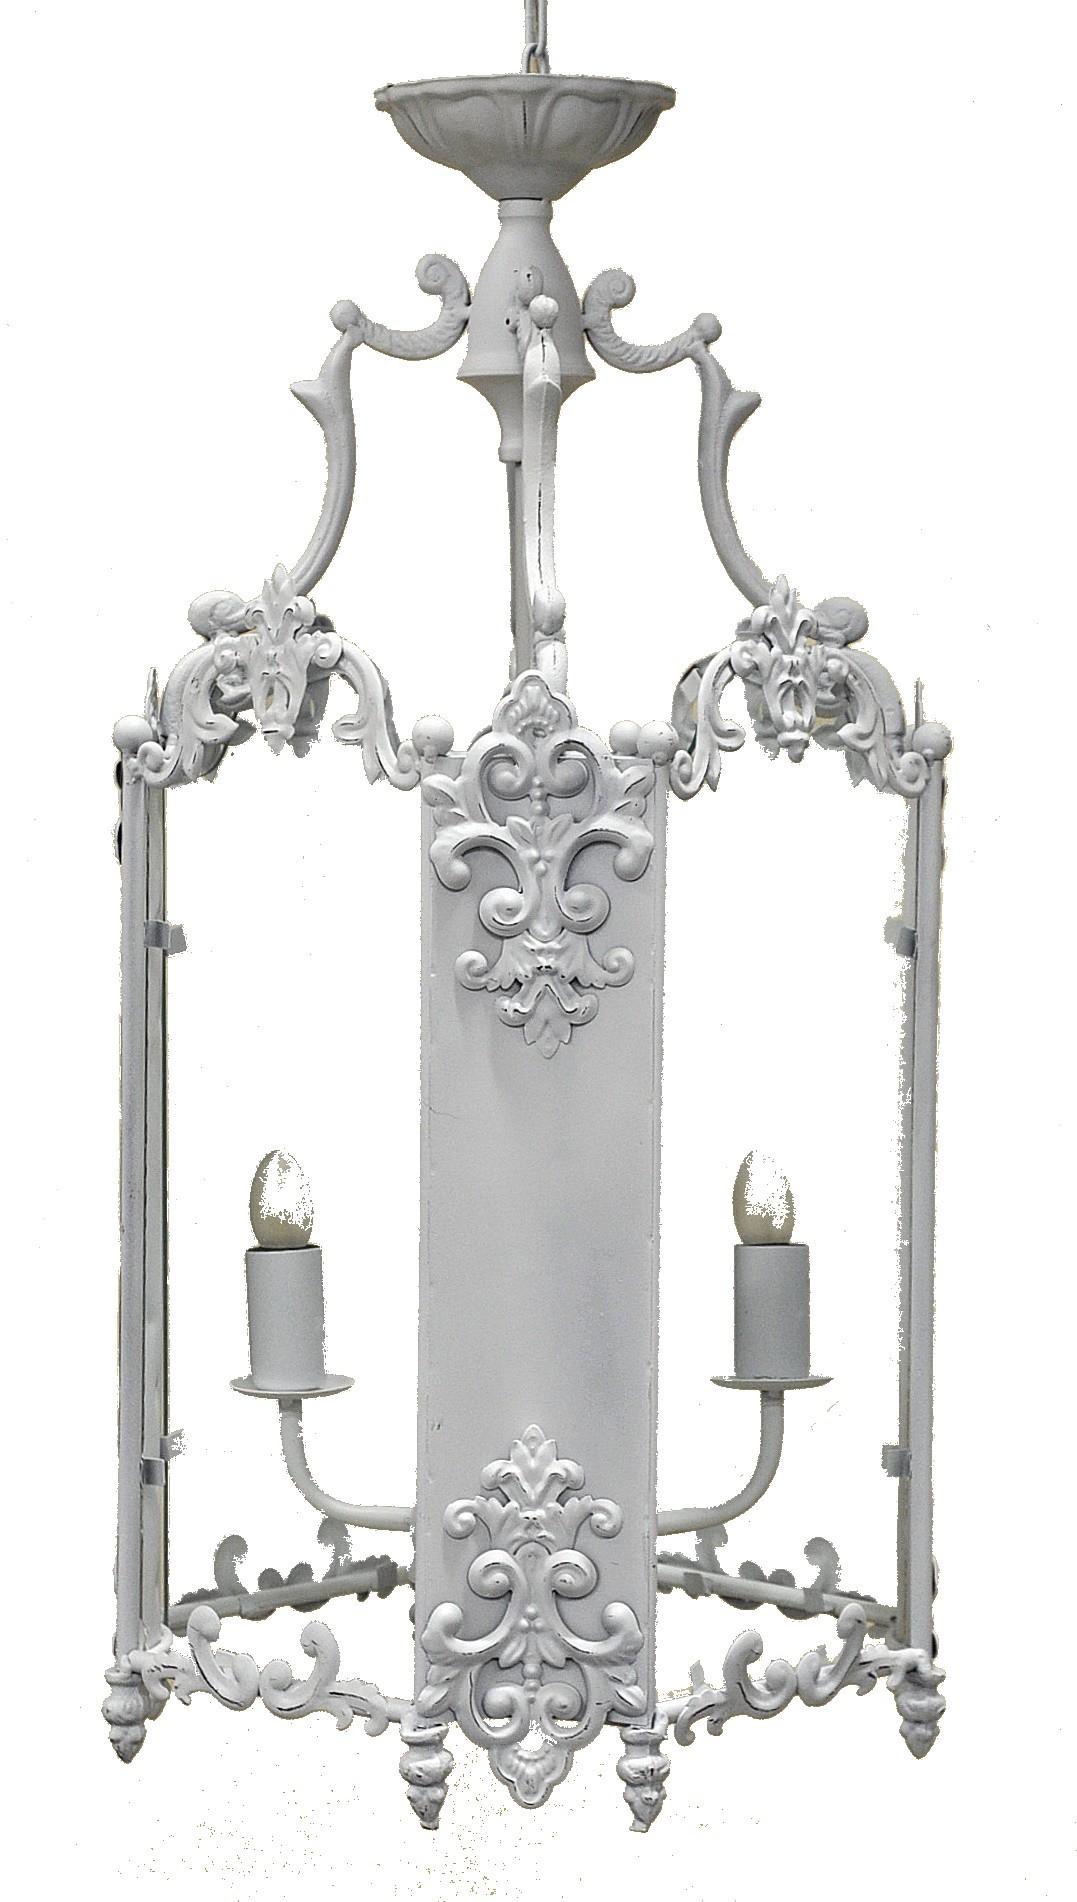 Lanterne fer forg blanche demeure et jardin for Porte lanterne fer forge